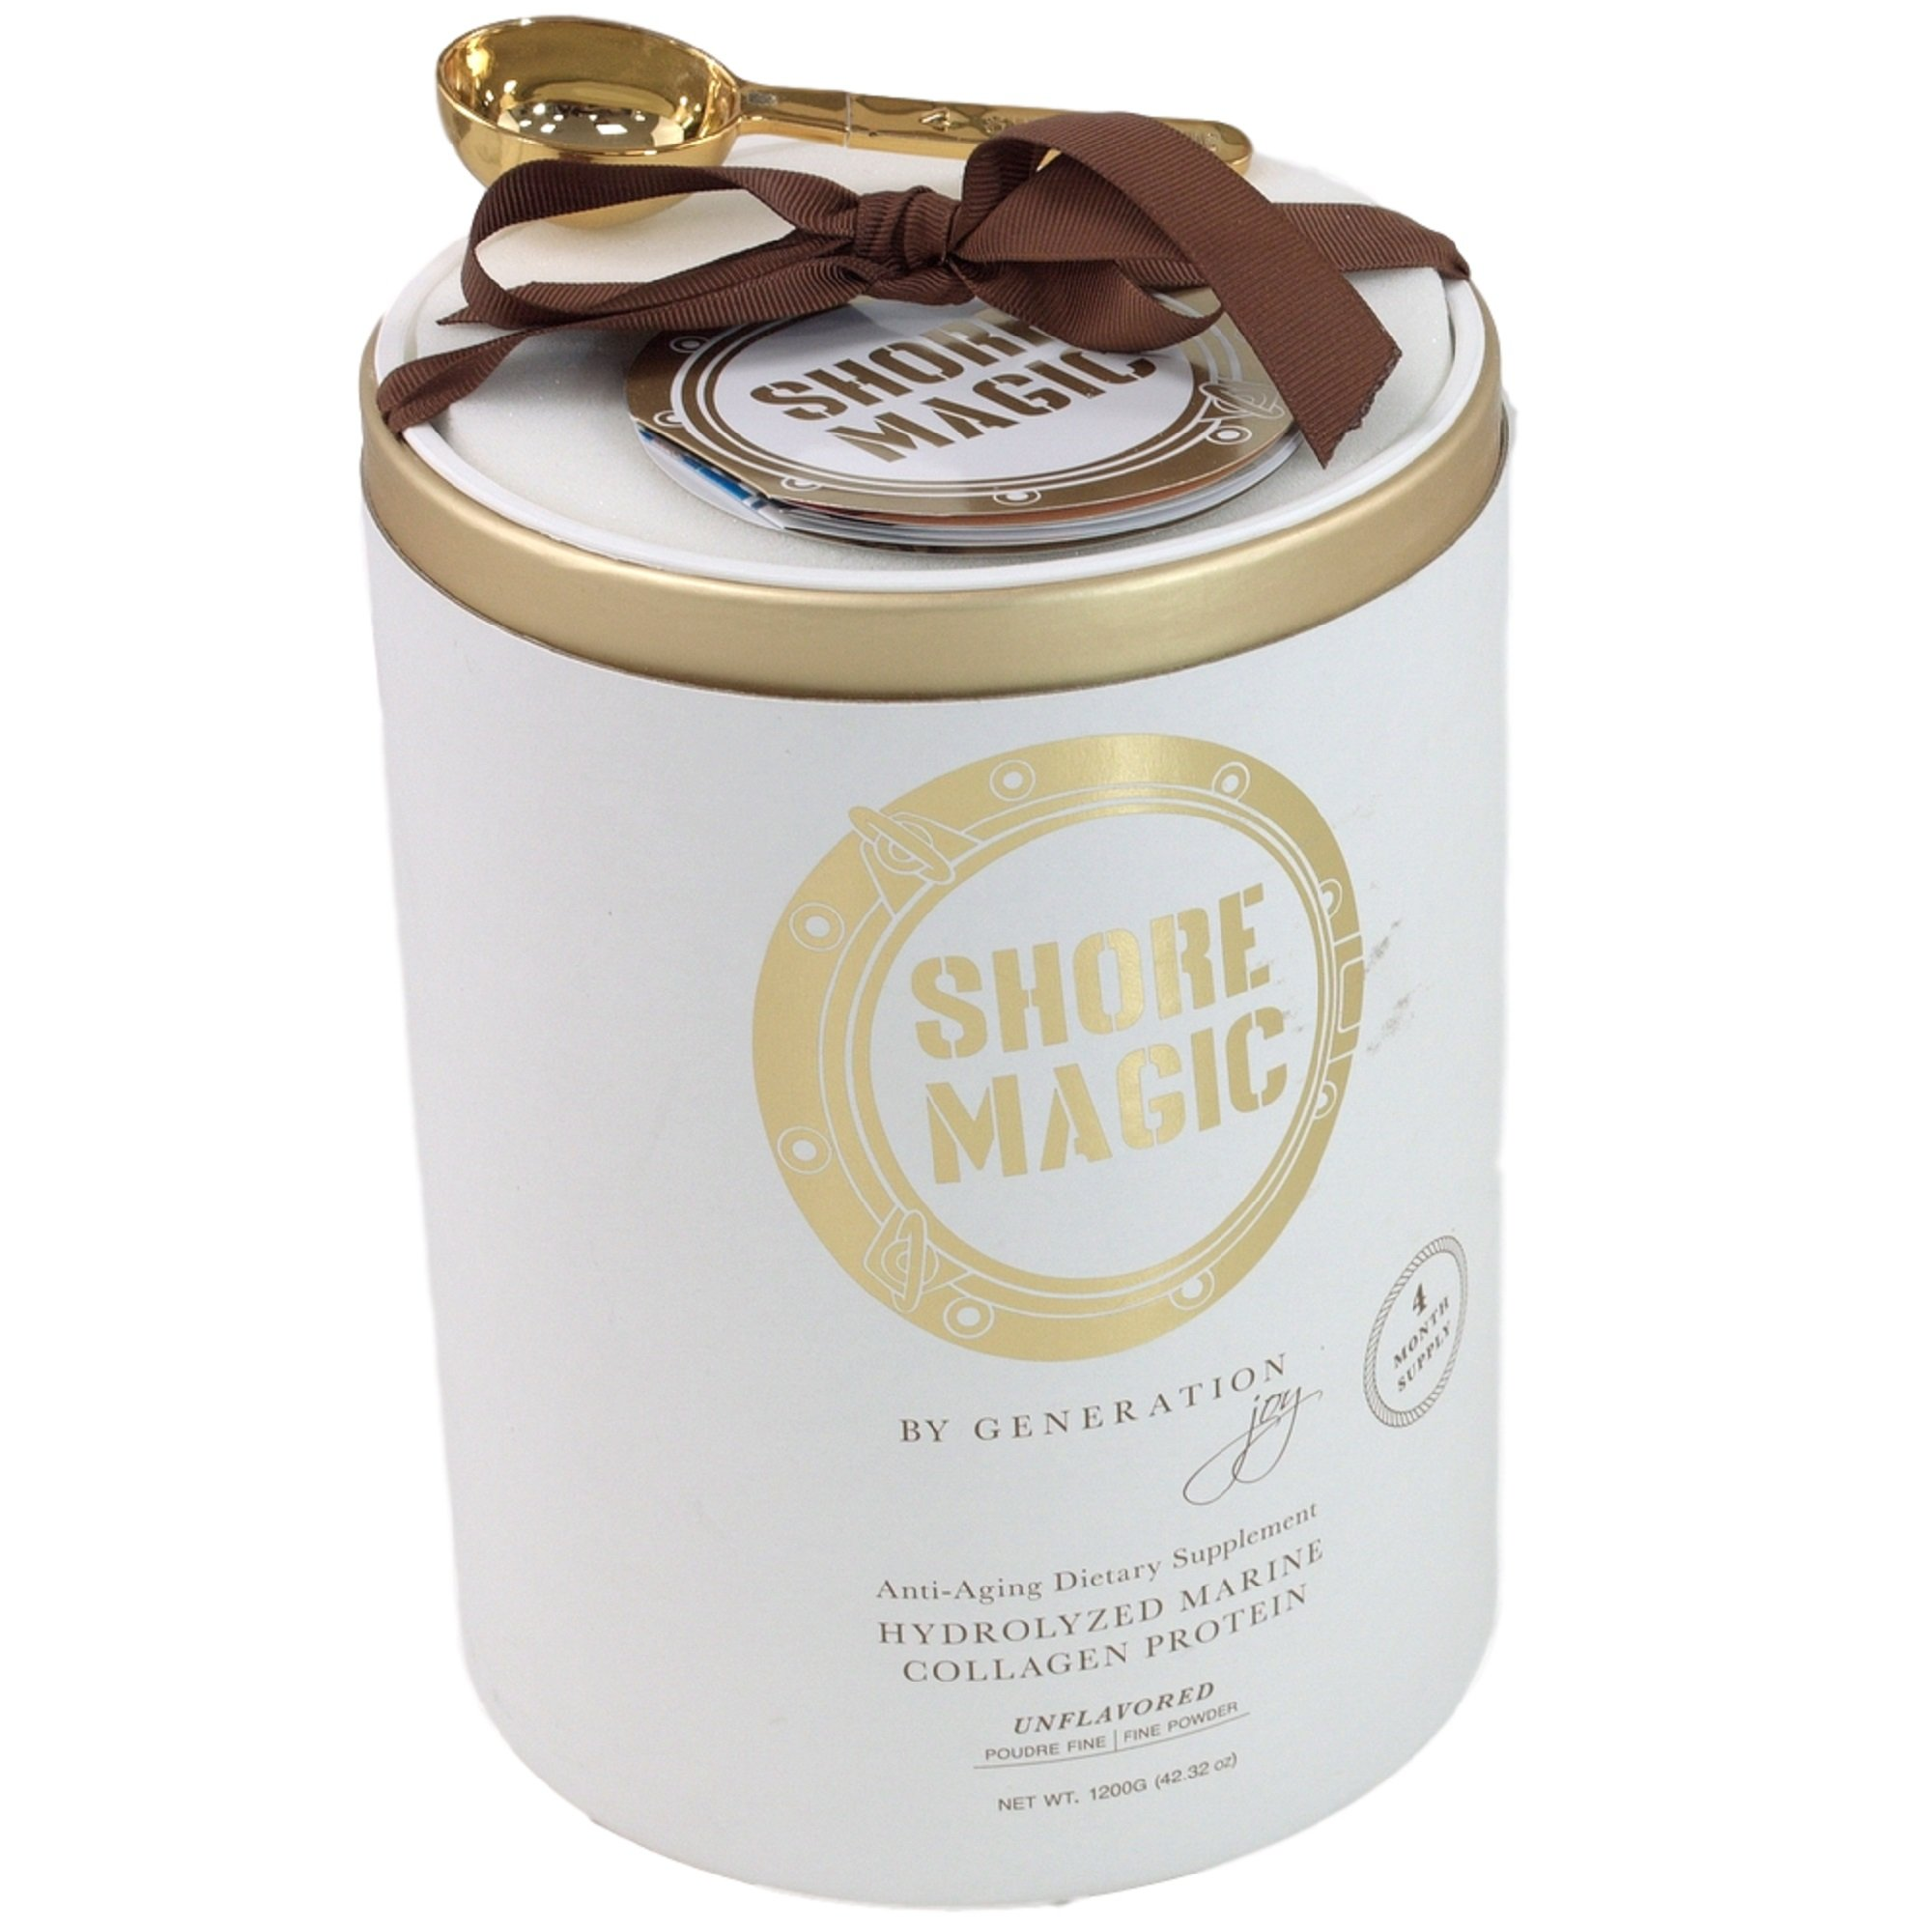 Shore Magic Pure Premium ONE INGREDIENT LUXURY Hydrolyzed Marine Collagen Powder (1200 Gram, Four Month Supply) by Shore Magic® (Image #1)